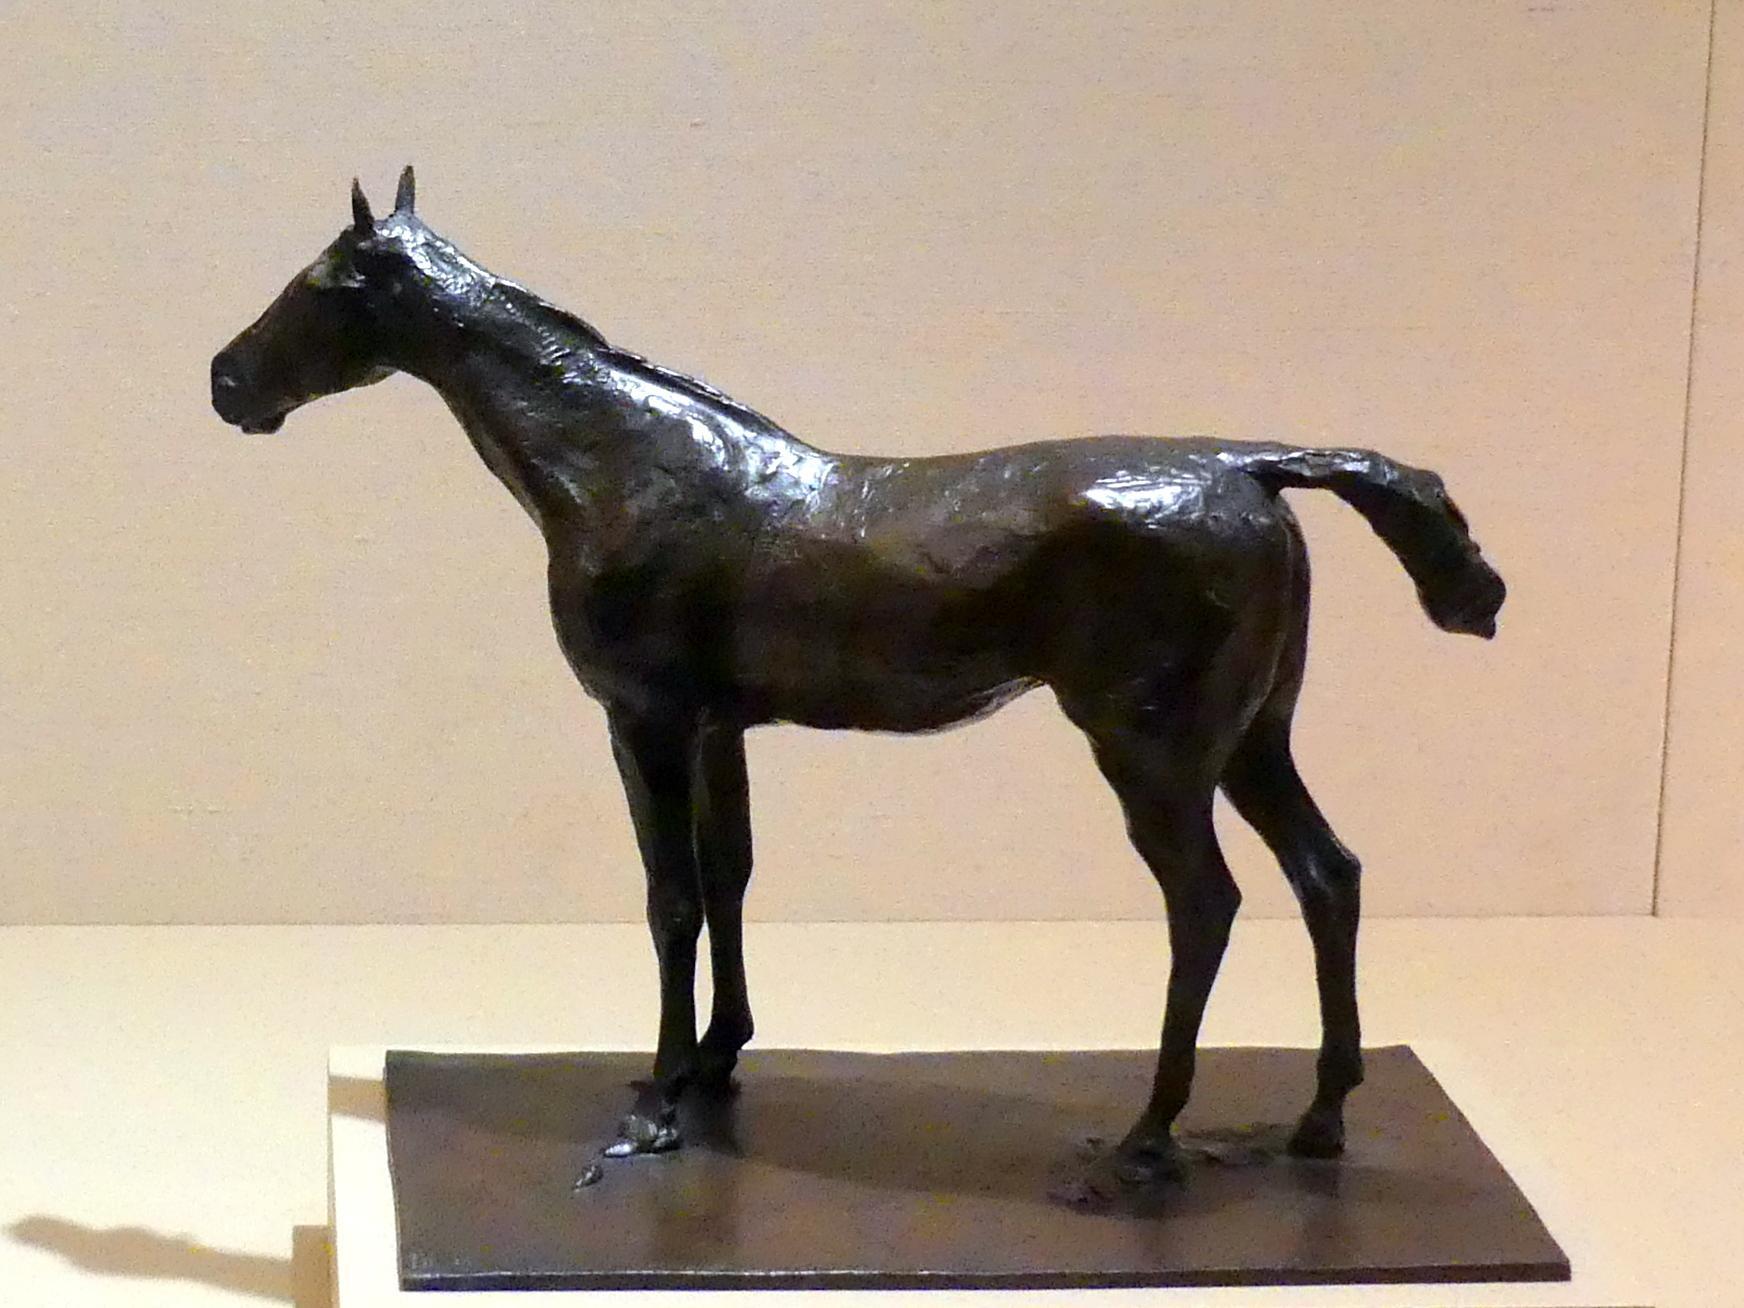 Edgar Degas: Stehendes Pferd, um 1881 - 1882